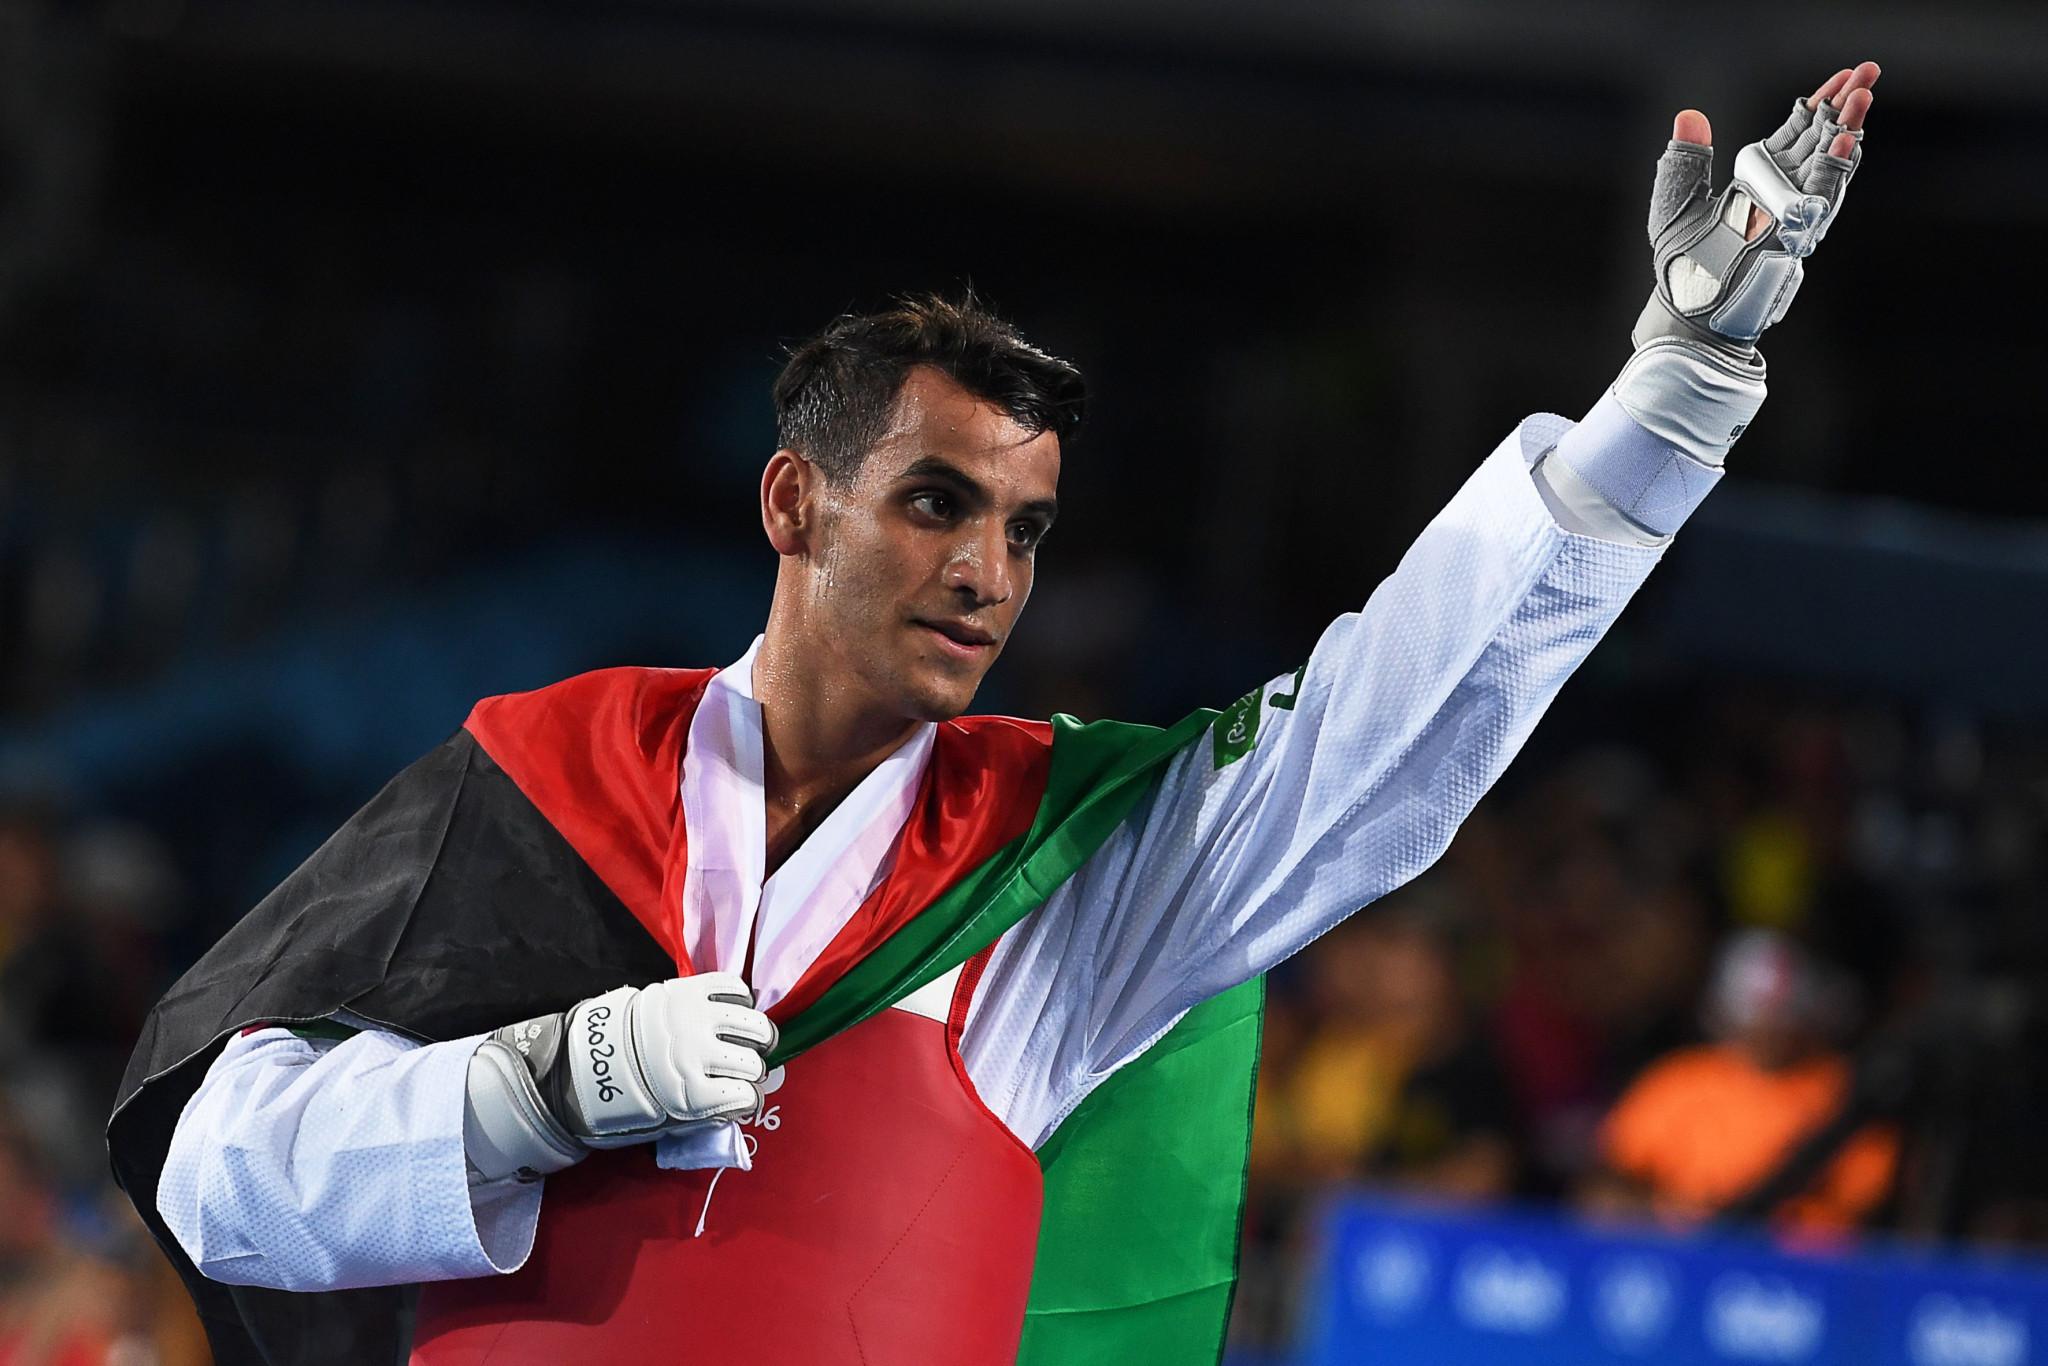 Jordan hails growth of taekwondo under reign of King Abdullah II